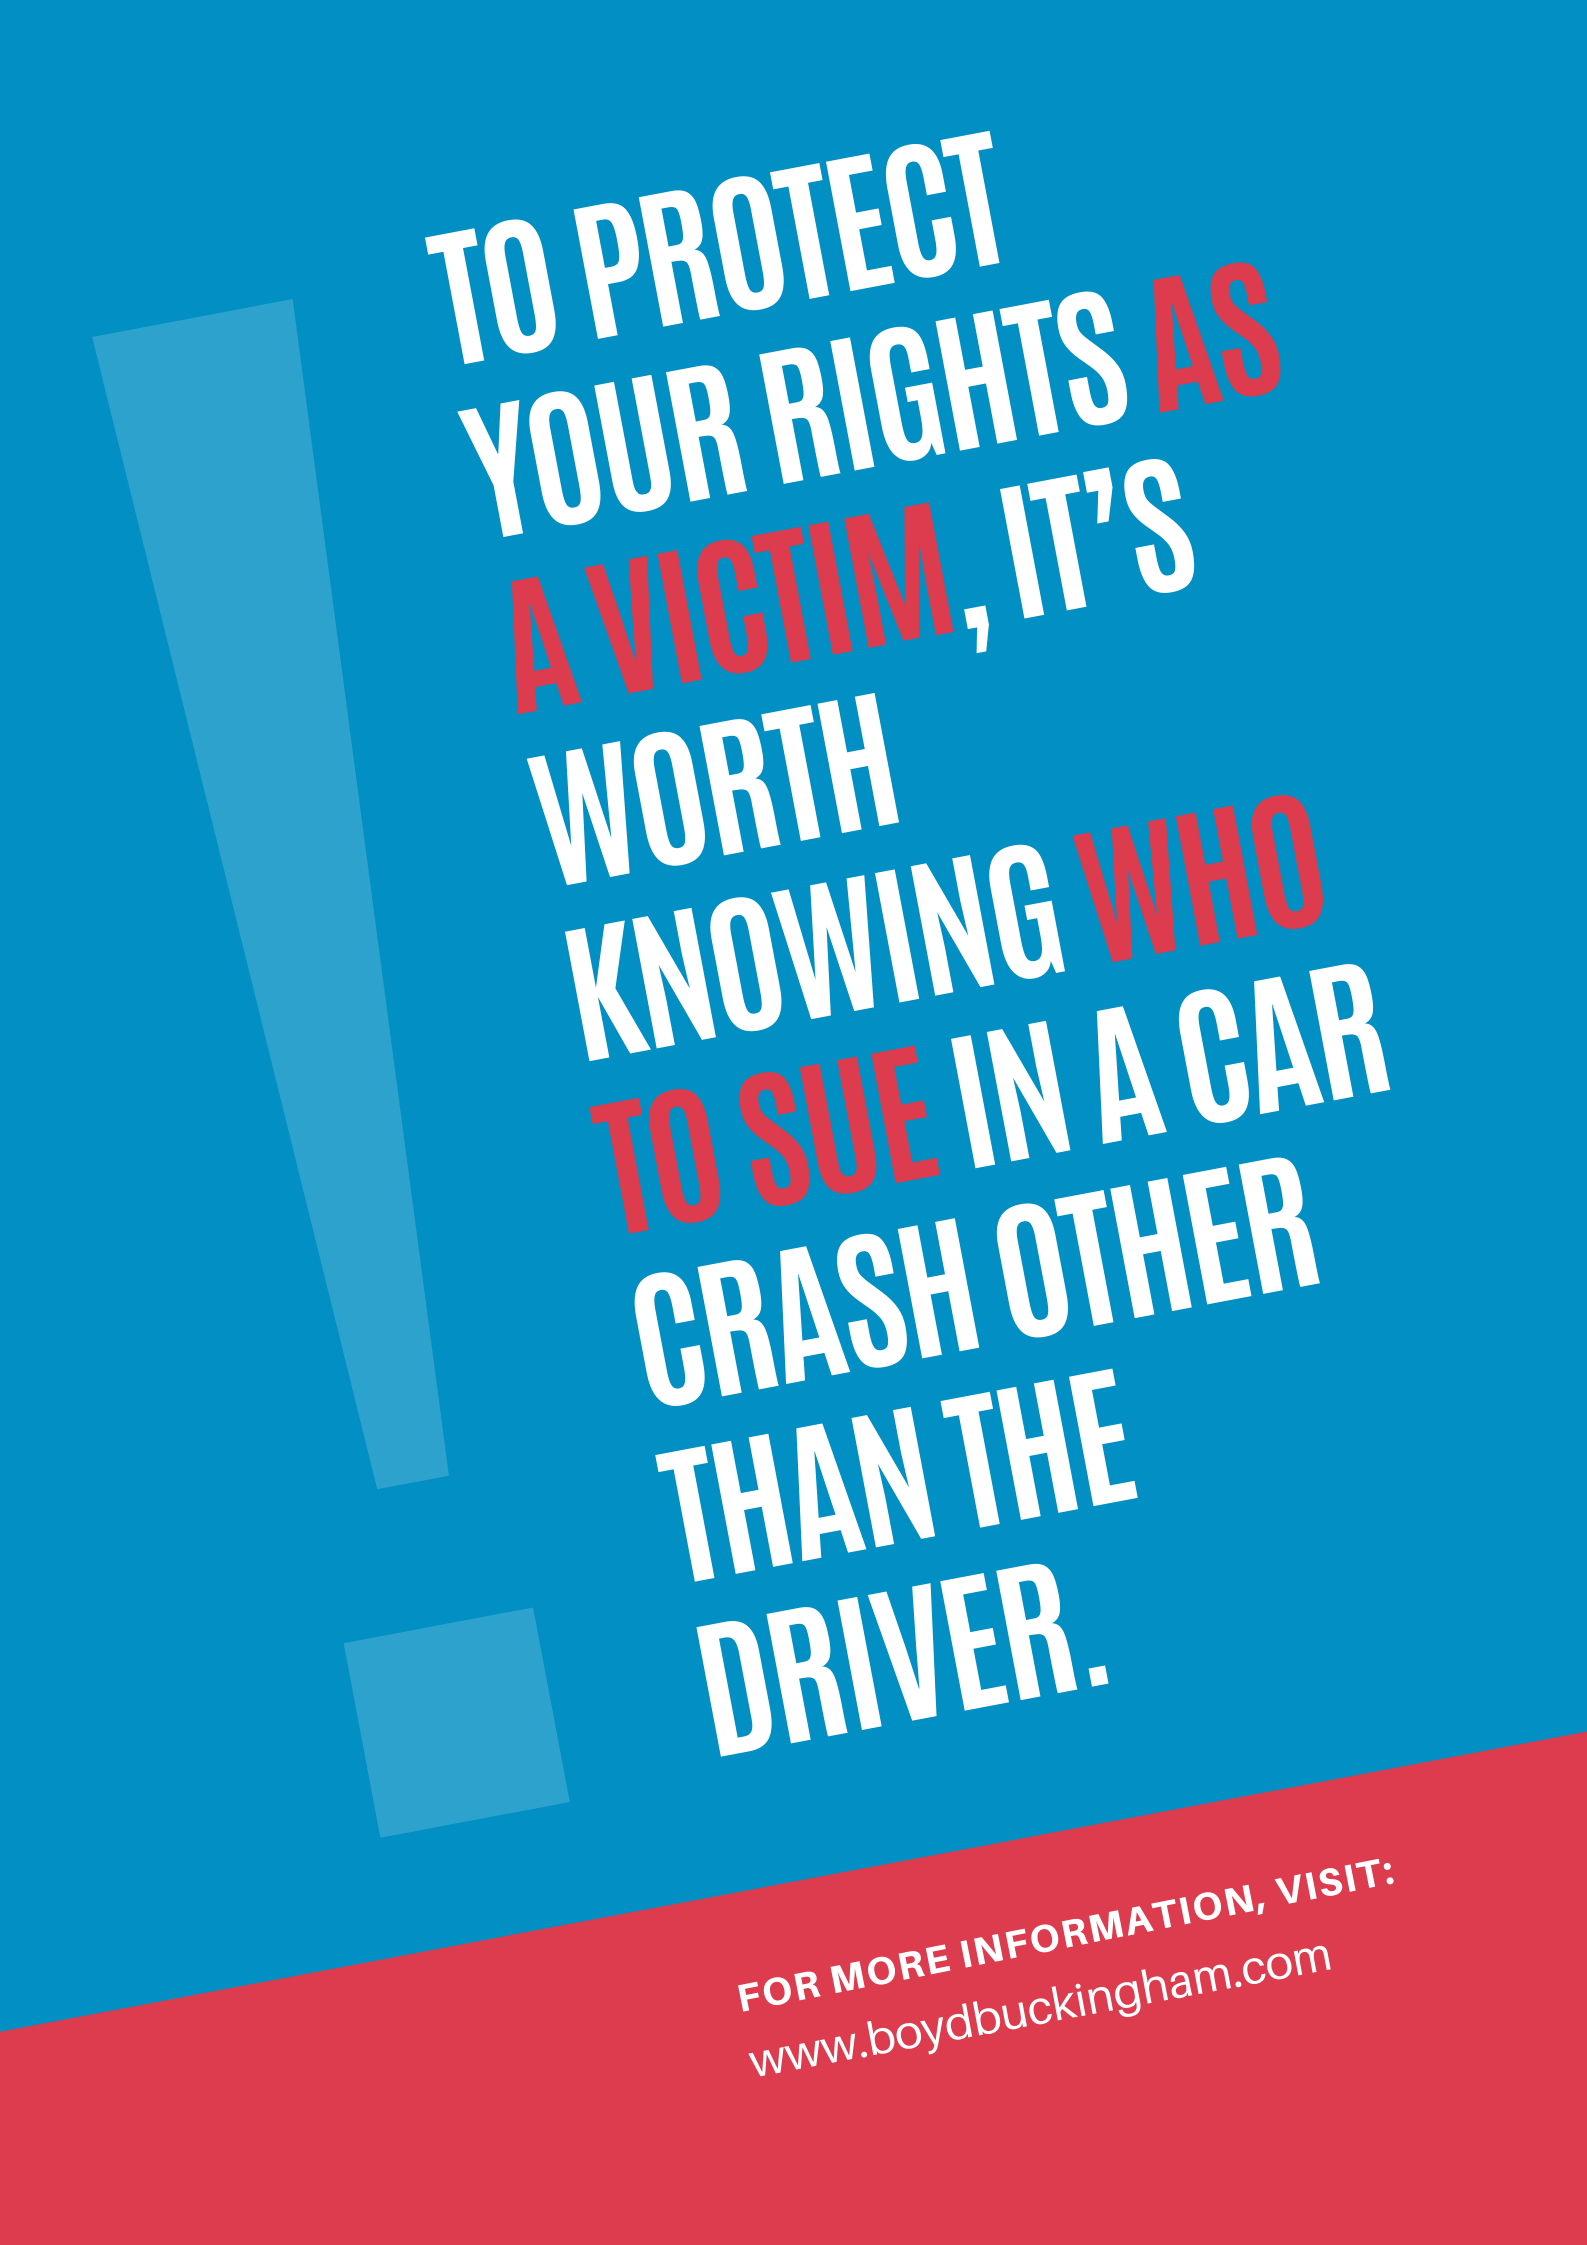 car crash infographic